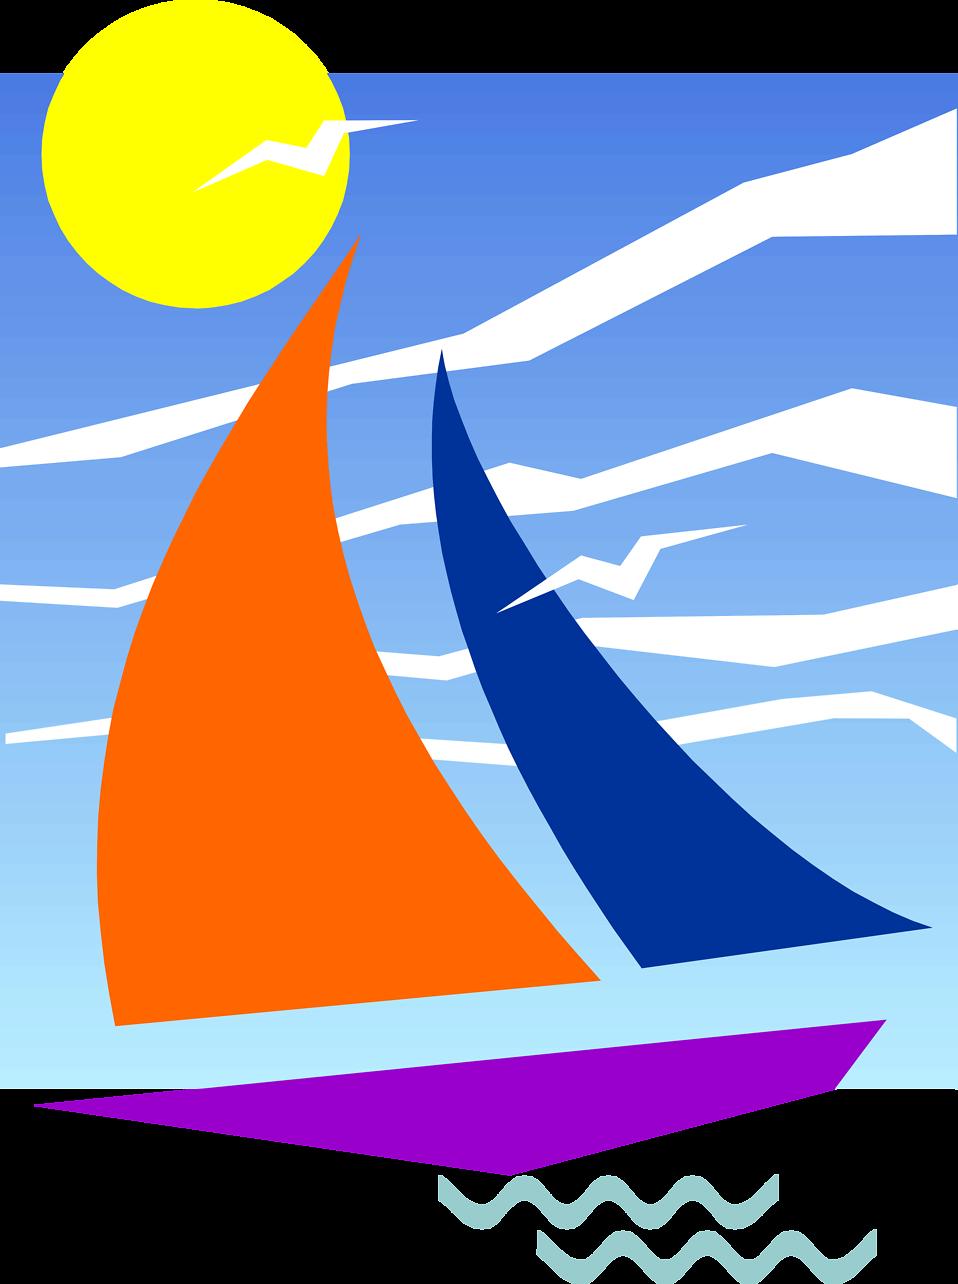 image free Sailboat free stock photo. Yacht clipart wave boat